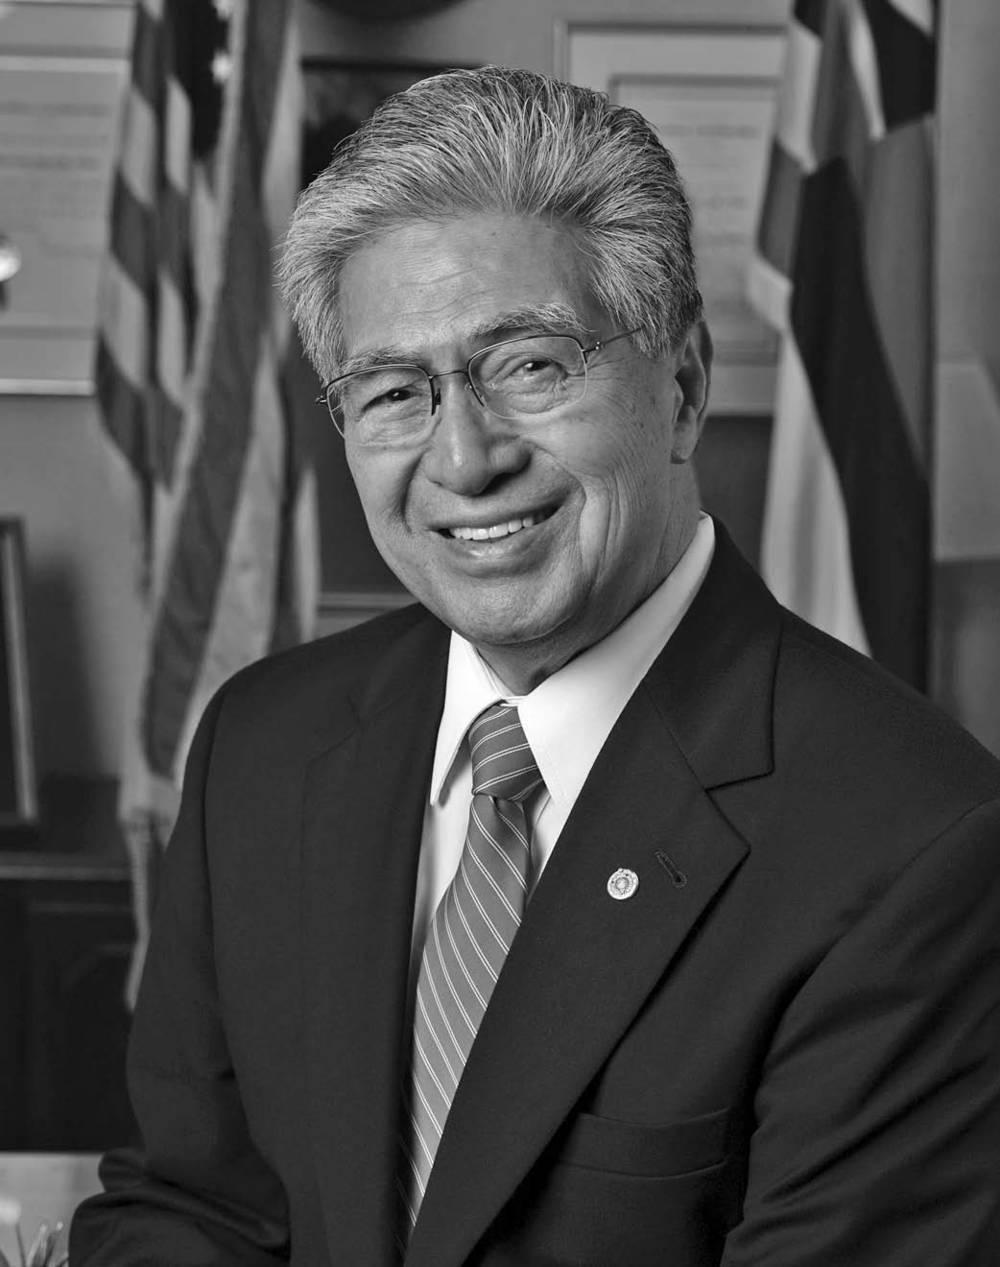 Sen. Daniel K. Akaka